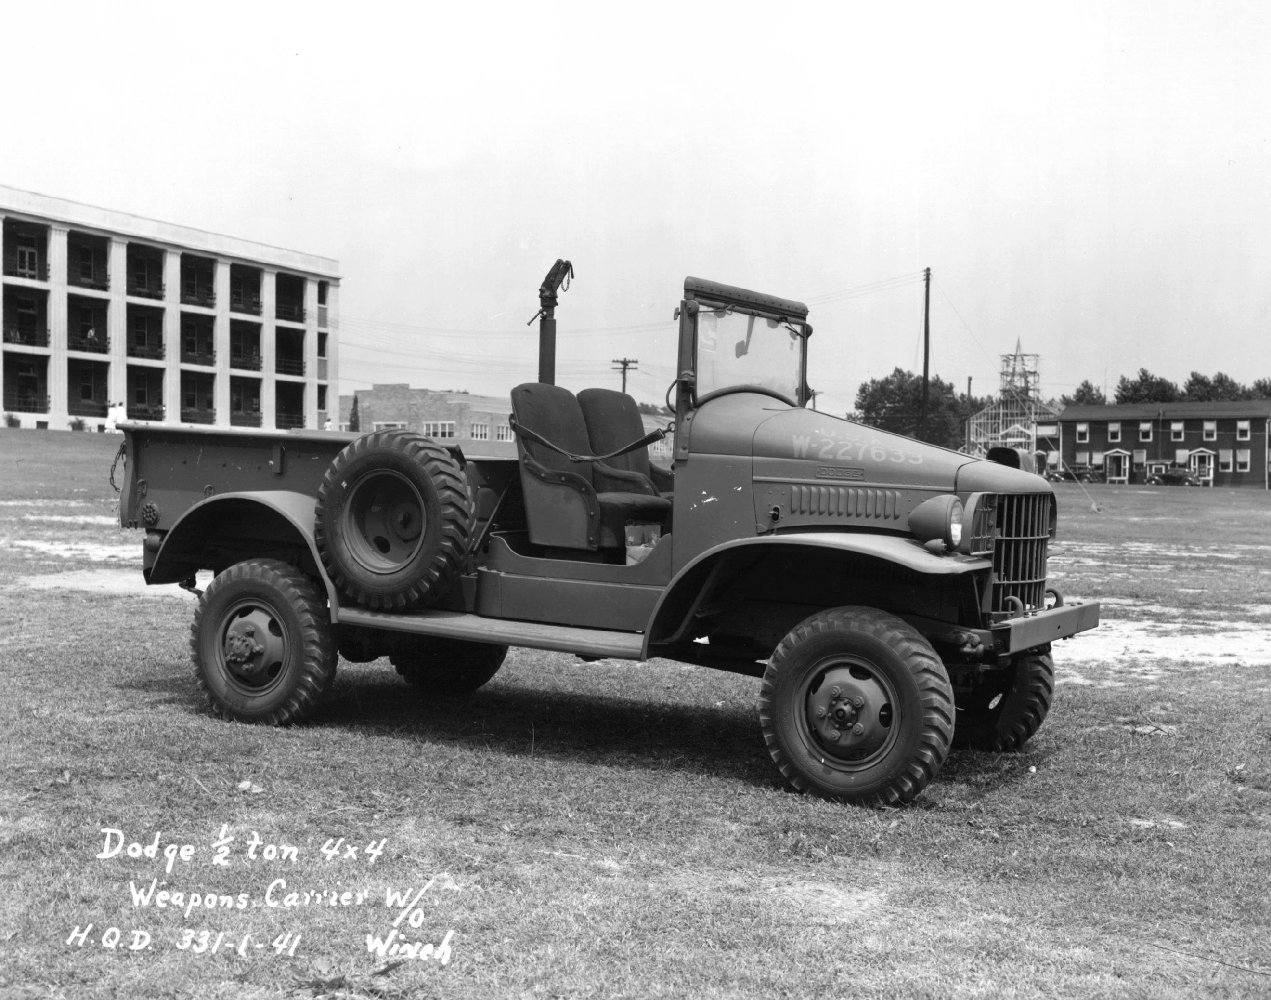 Dodge WC series T207 1941 - 1942 SUV #4